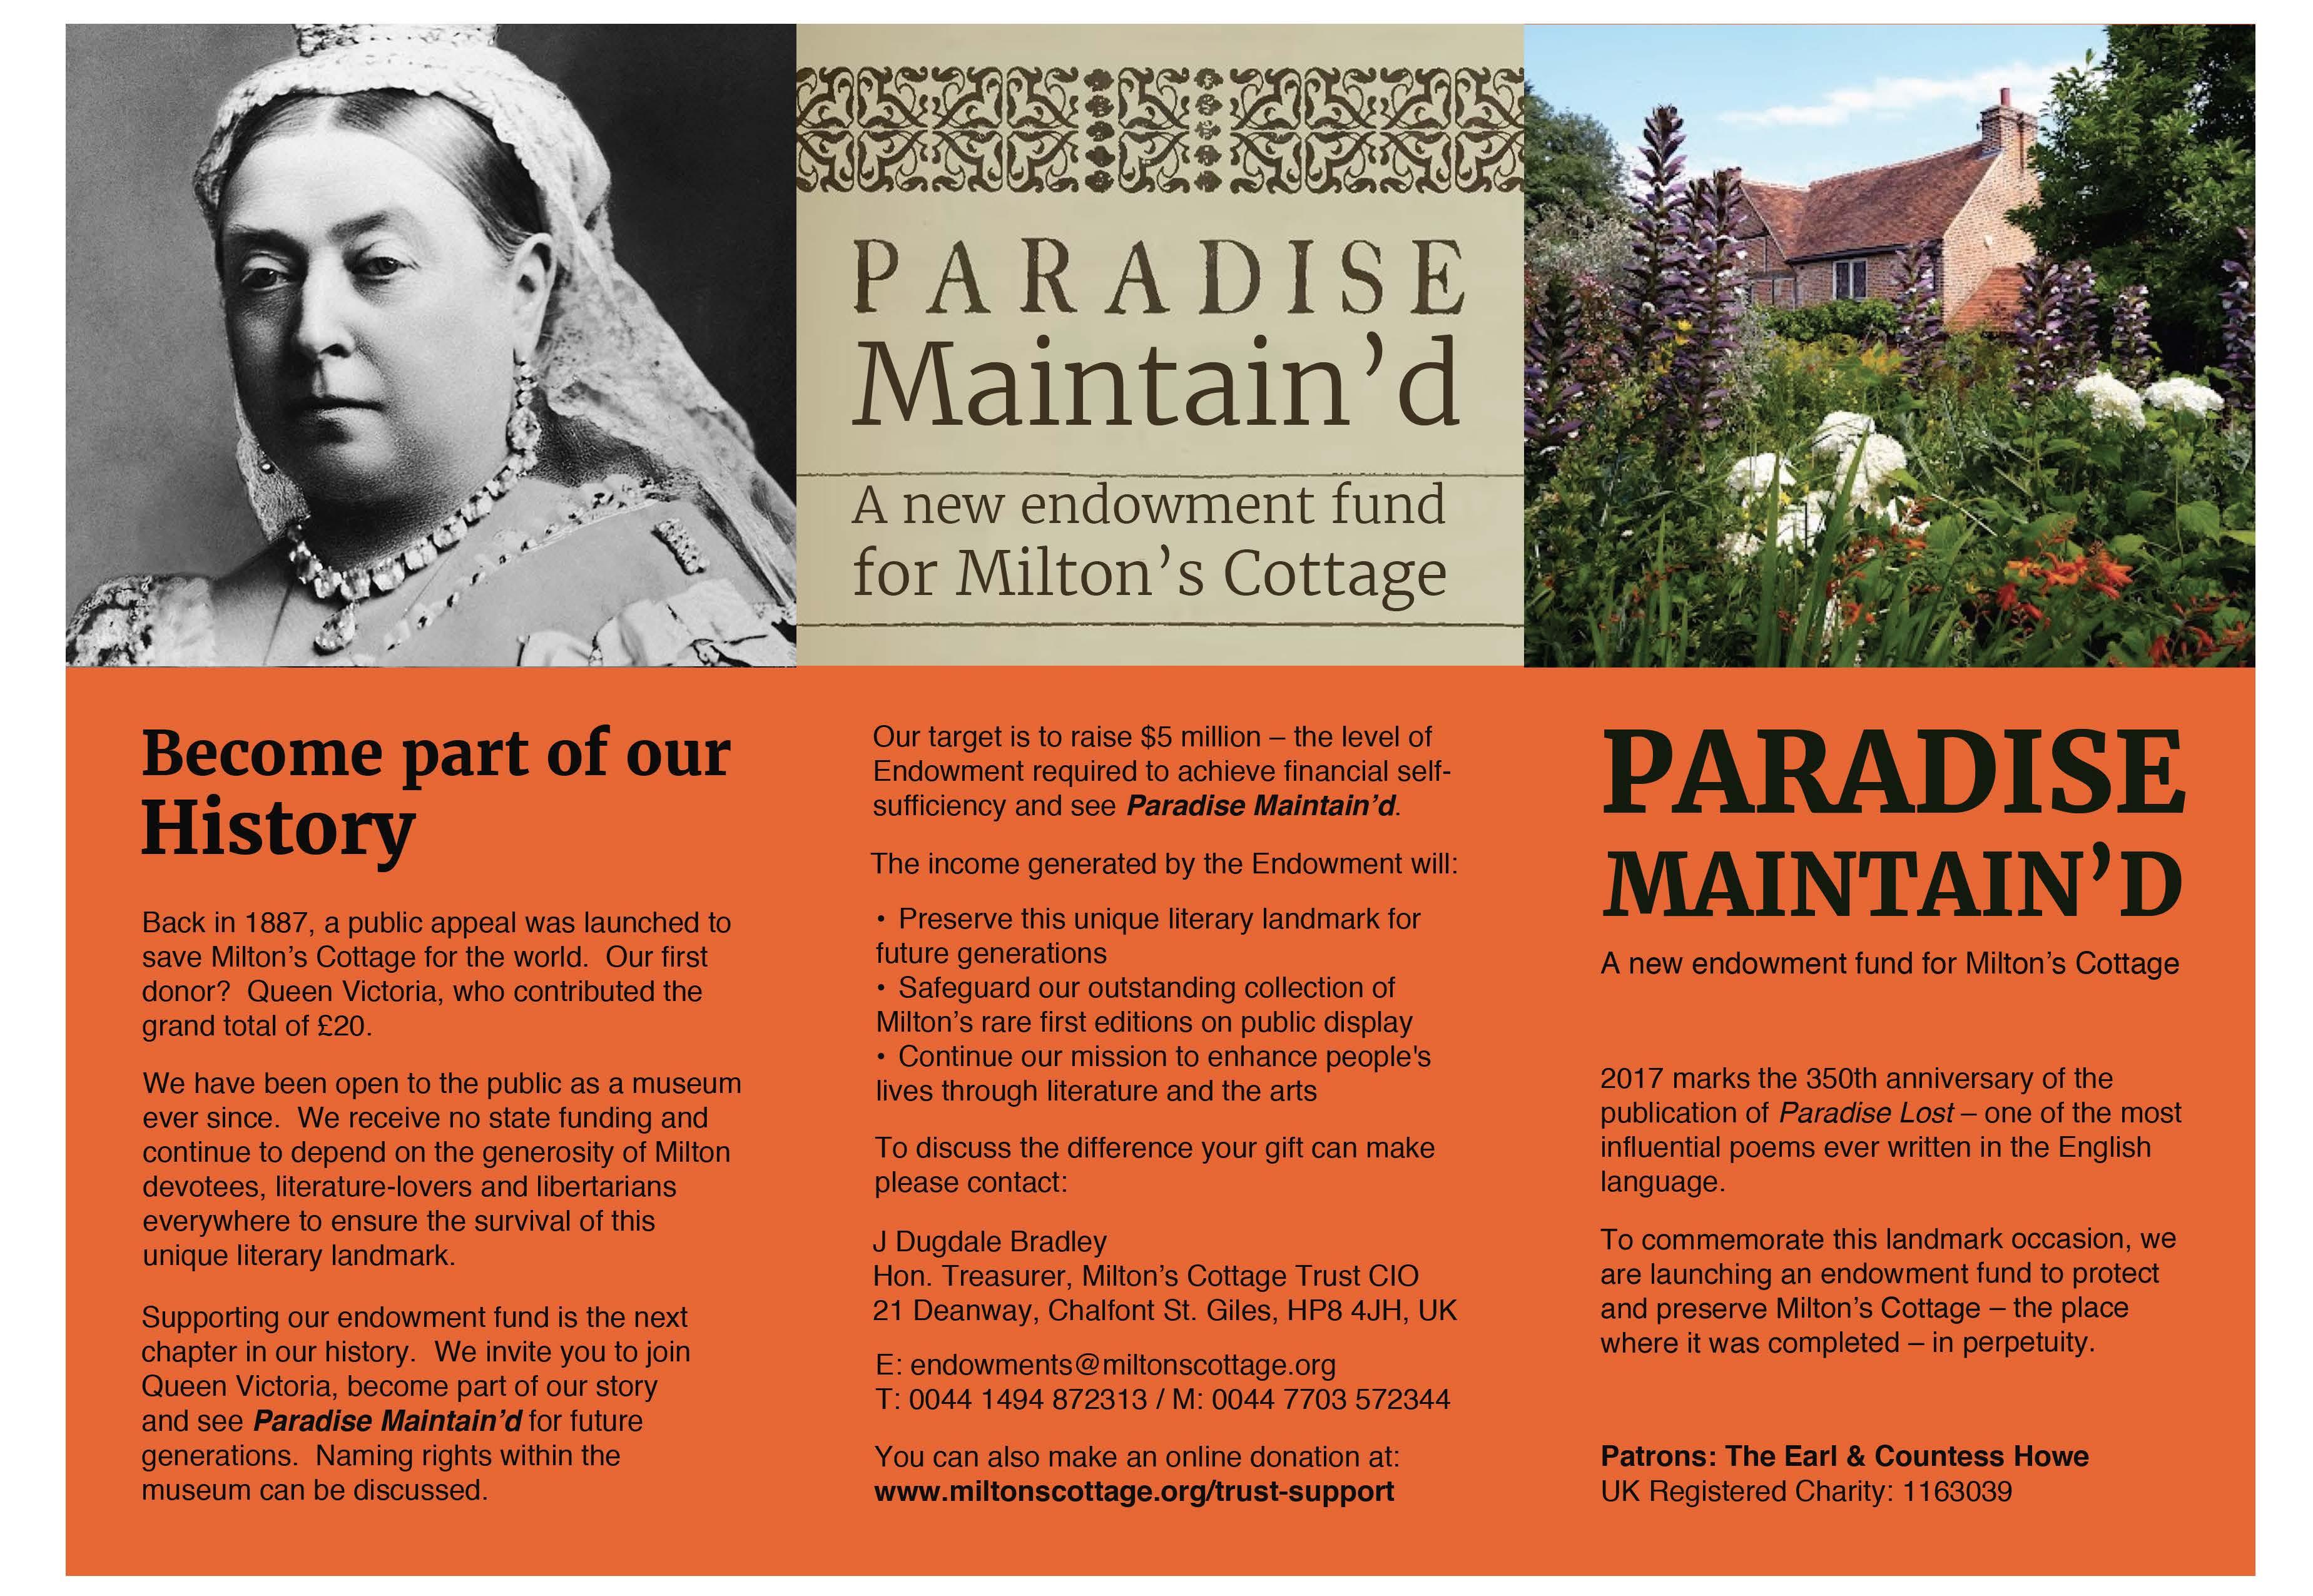 Paradise Maintain'd Endowment Fund